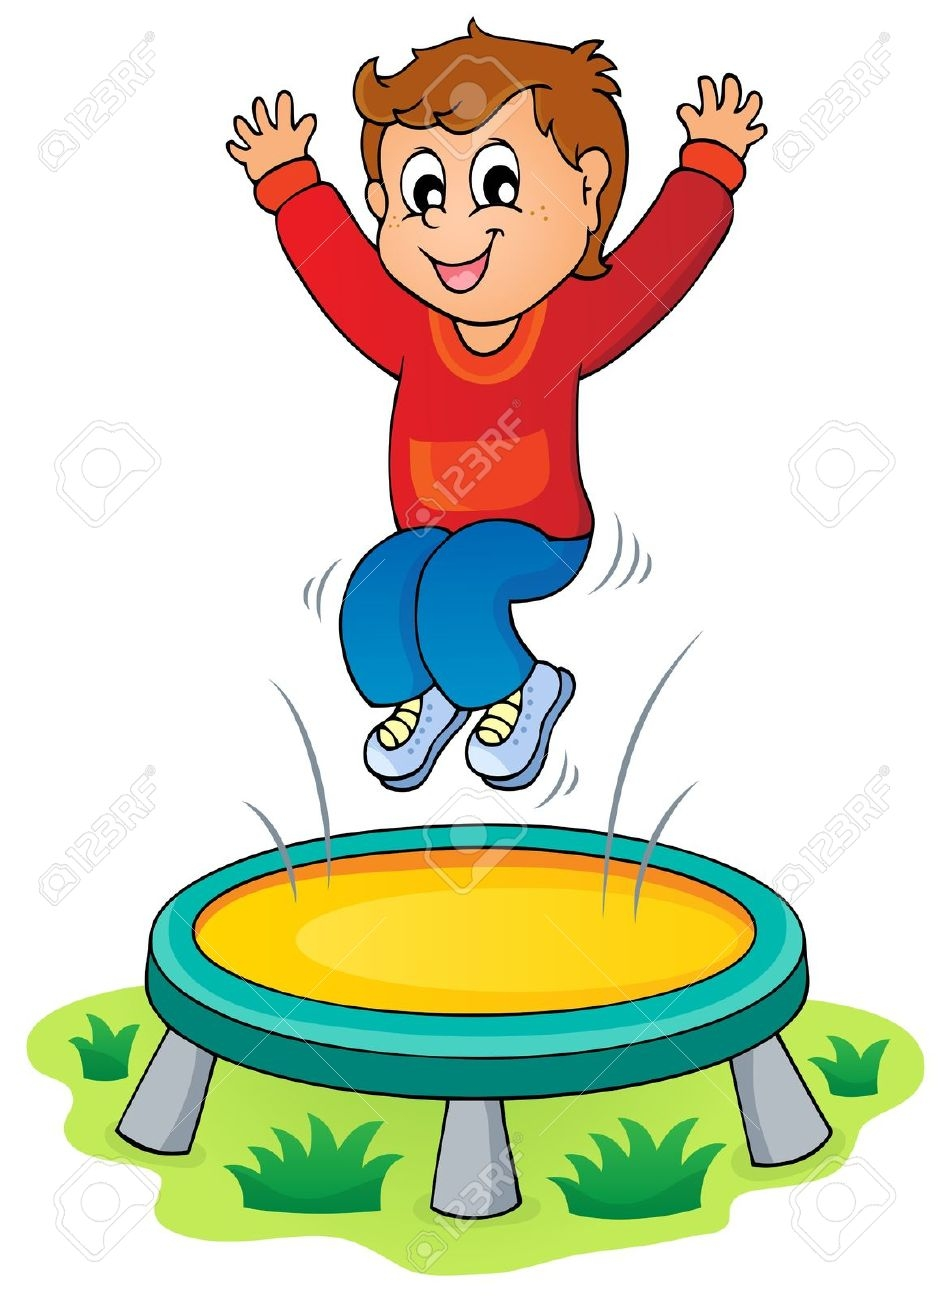 951x1300 The jump clipart